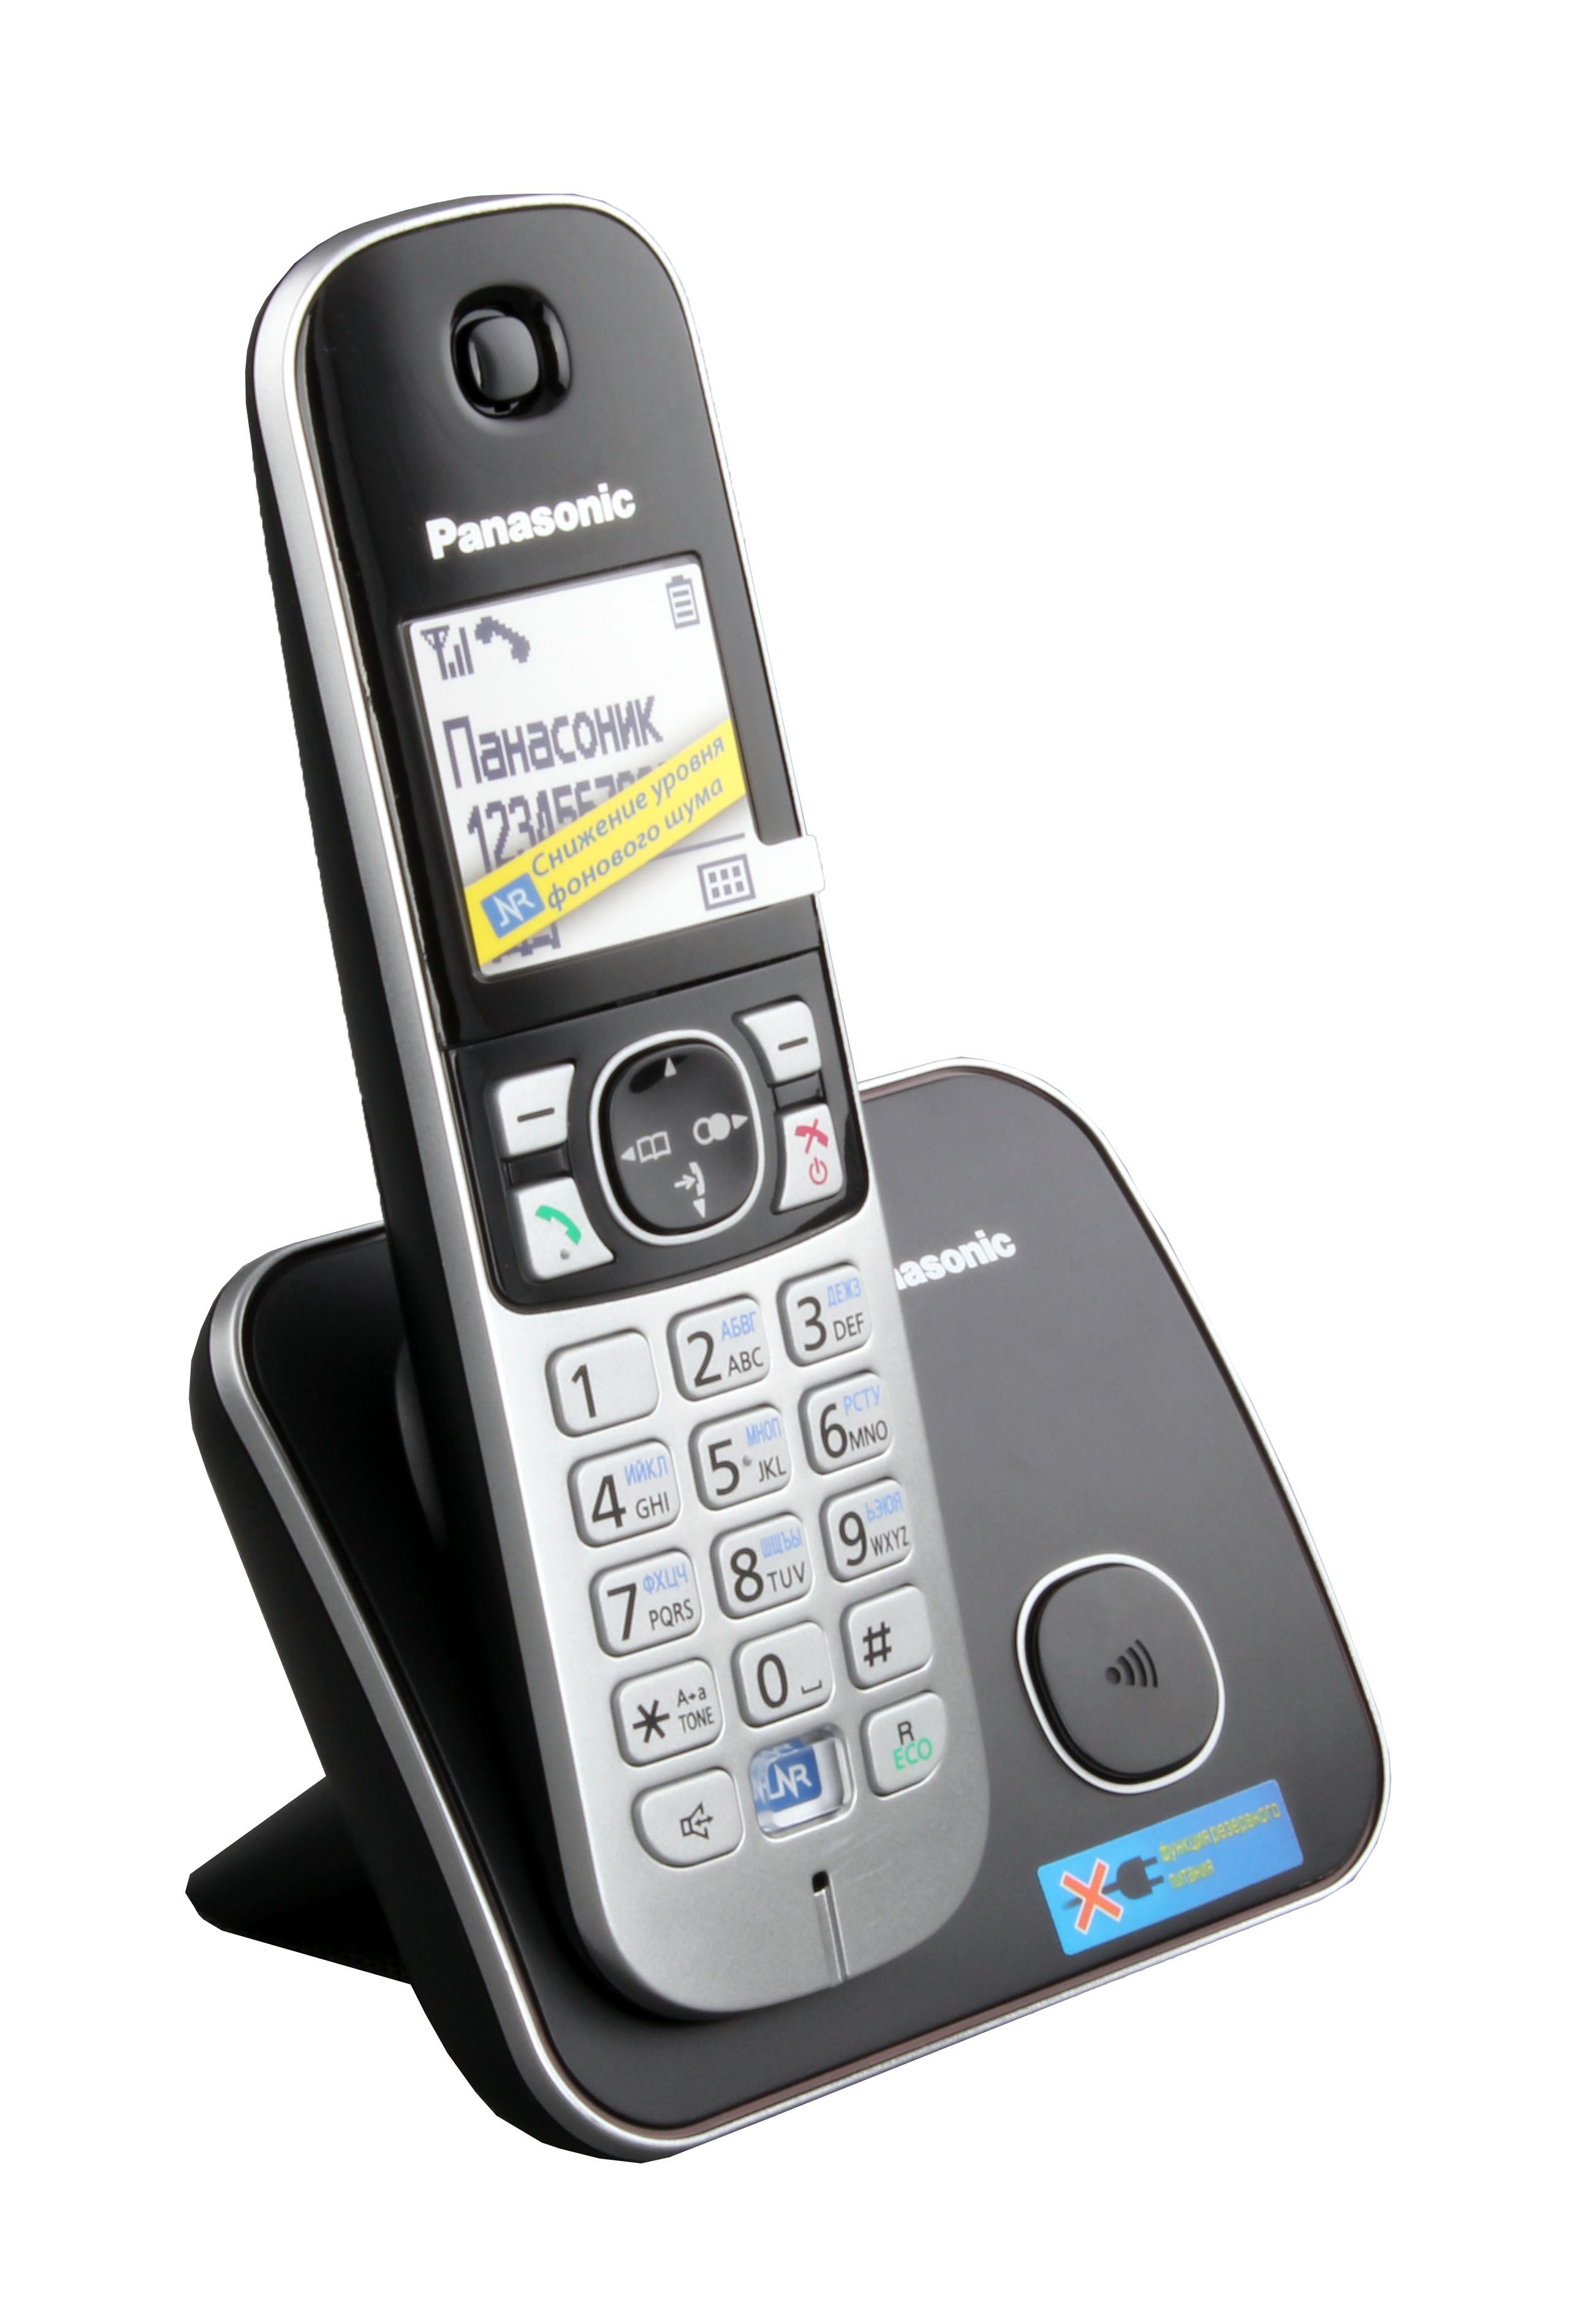 Радиотелефон Panasonic от RBT.ru